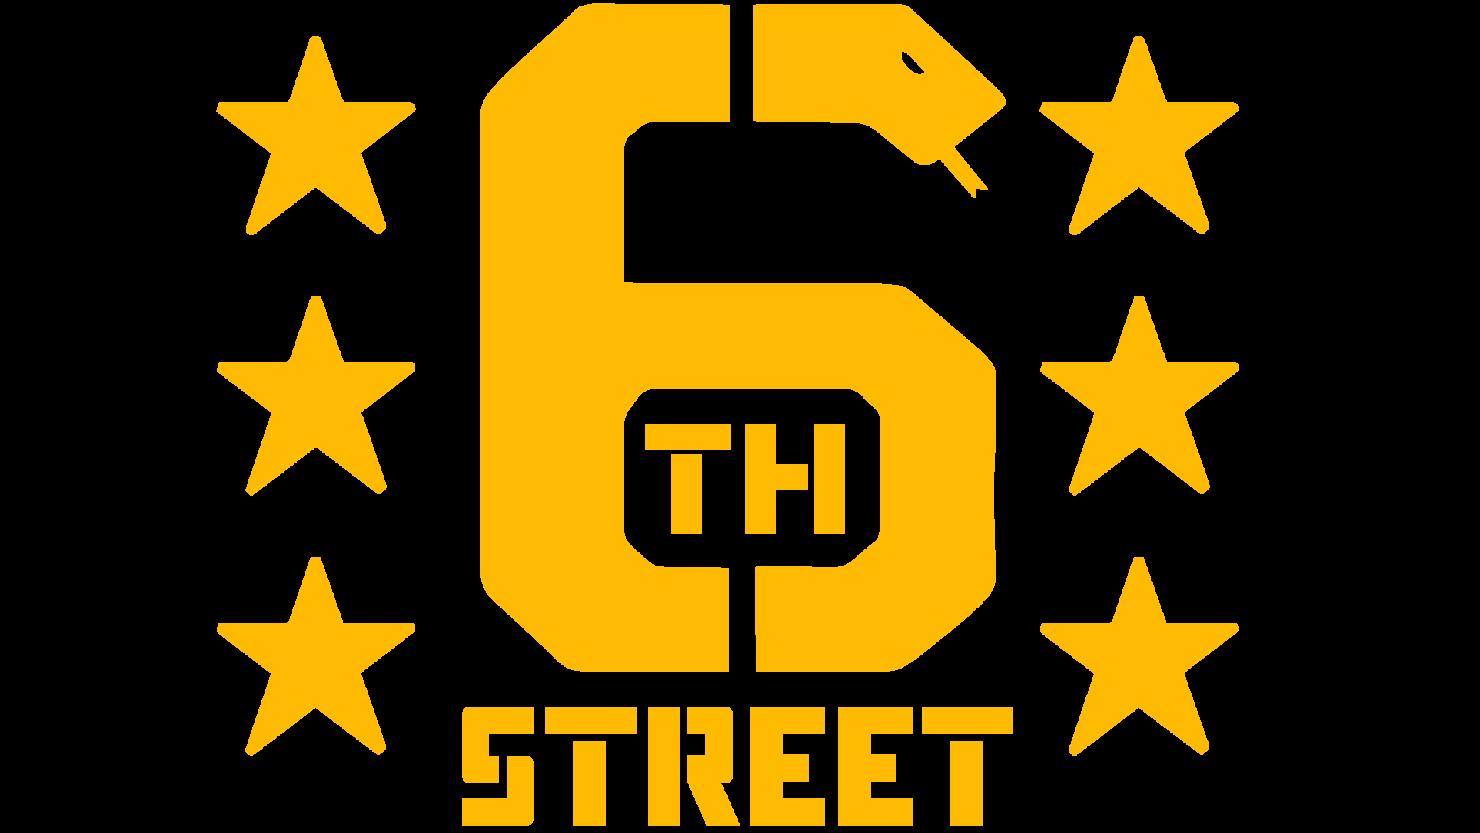 6th_street_text_logotype